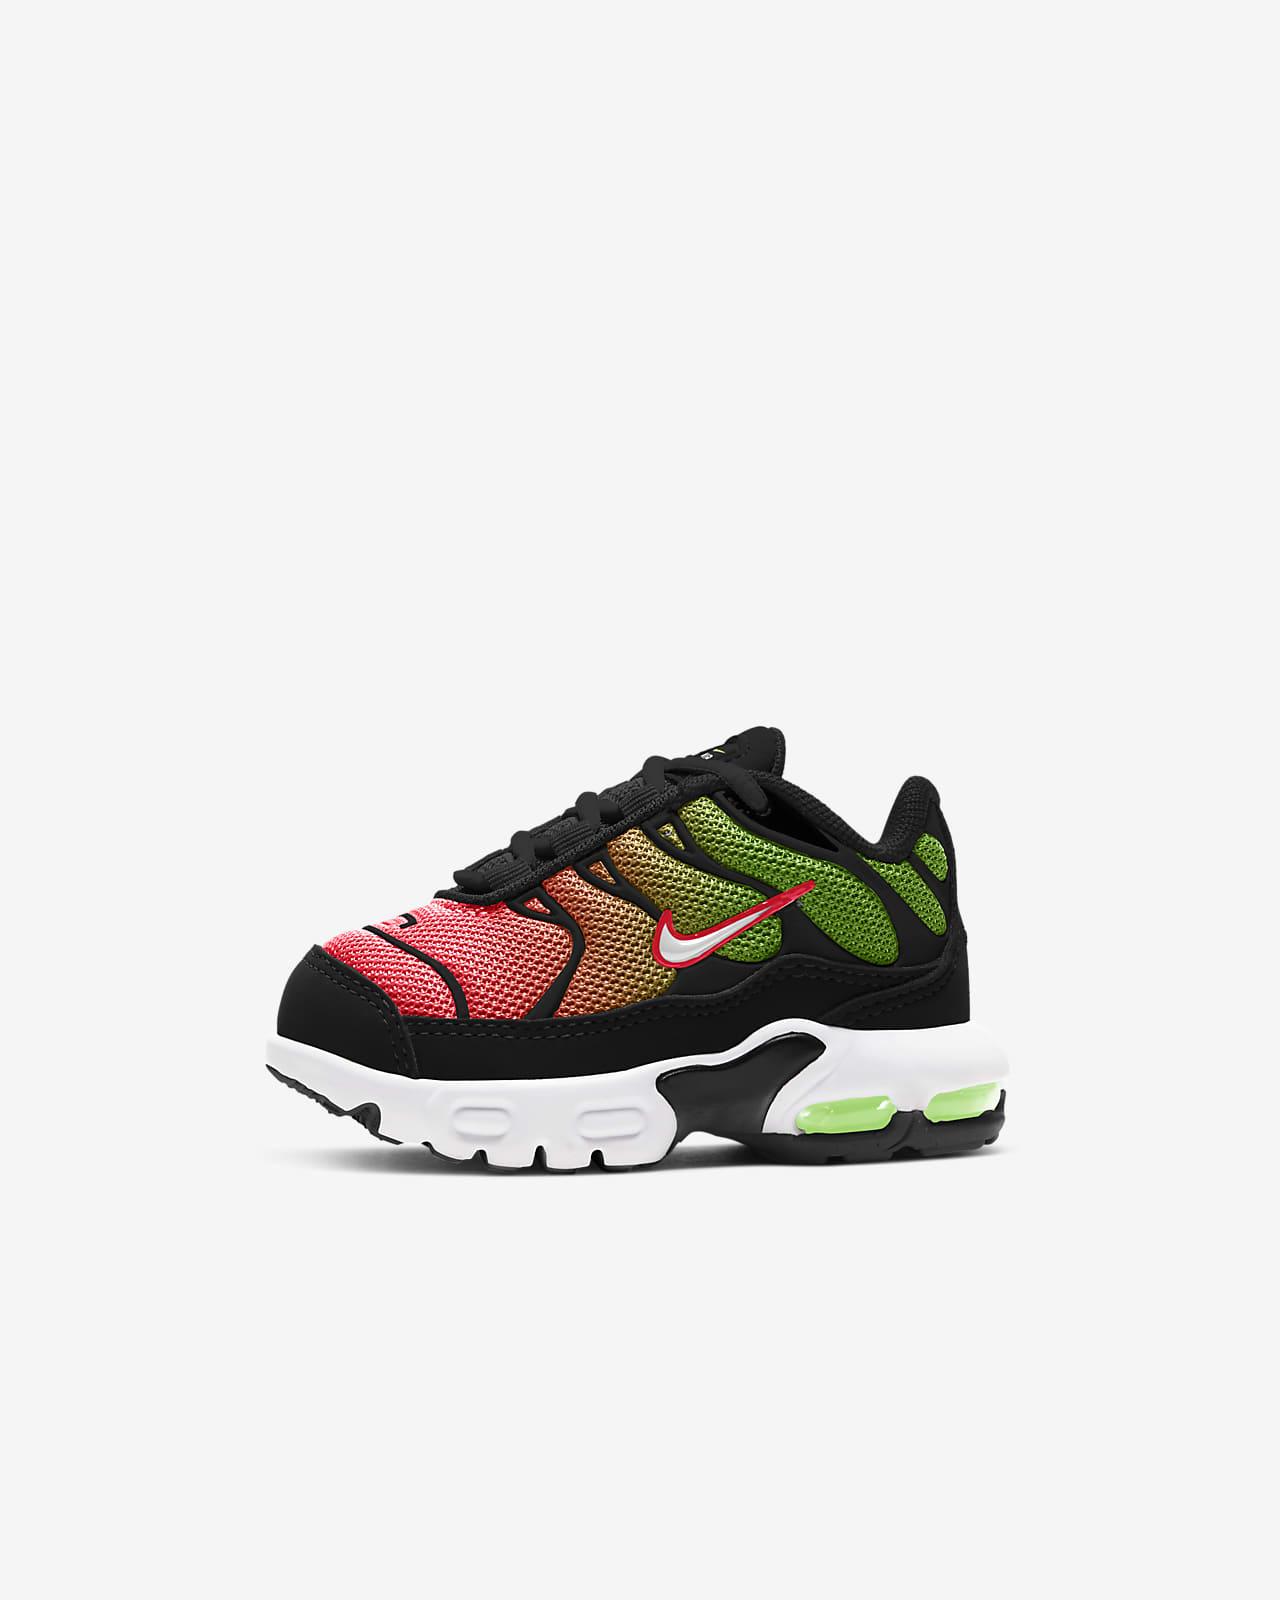 Sapatilhas Nike Air Max Plus para bebé